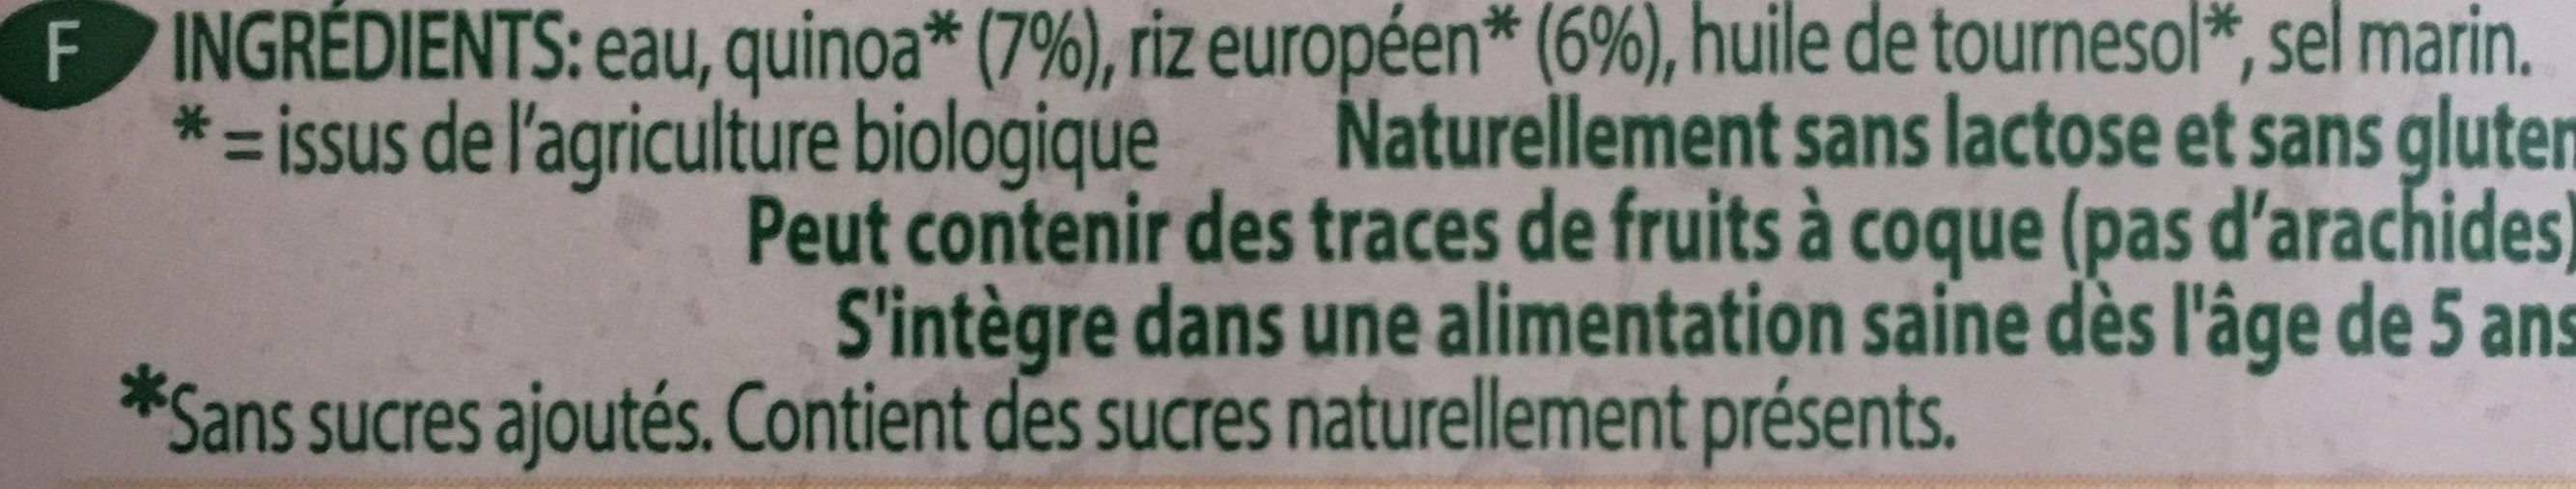 Quinoa-Riz - Ingredients